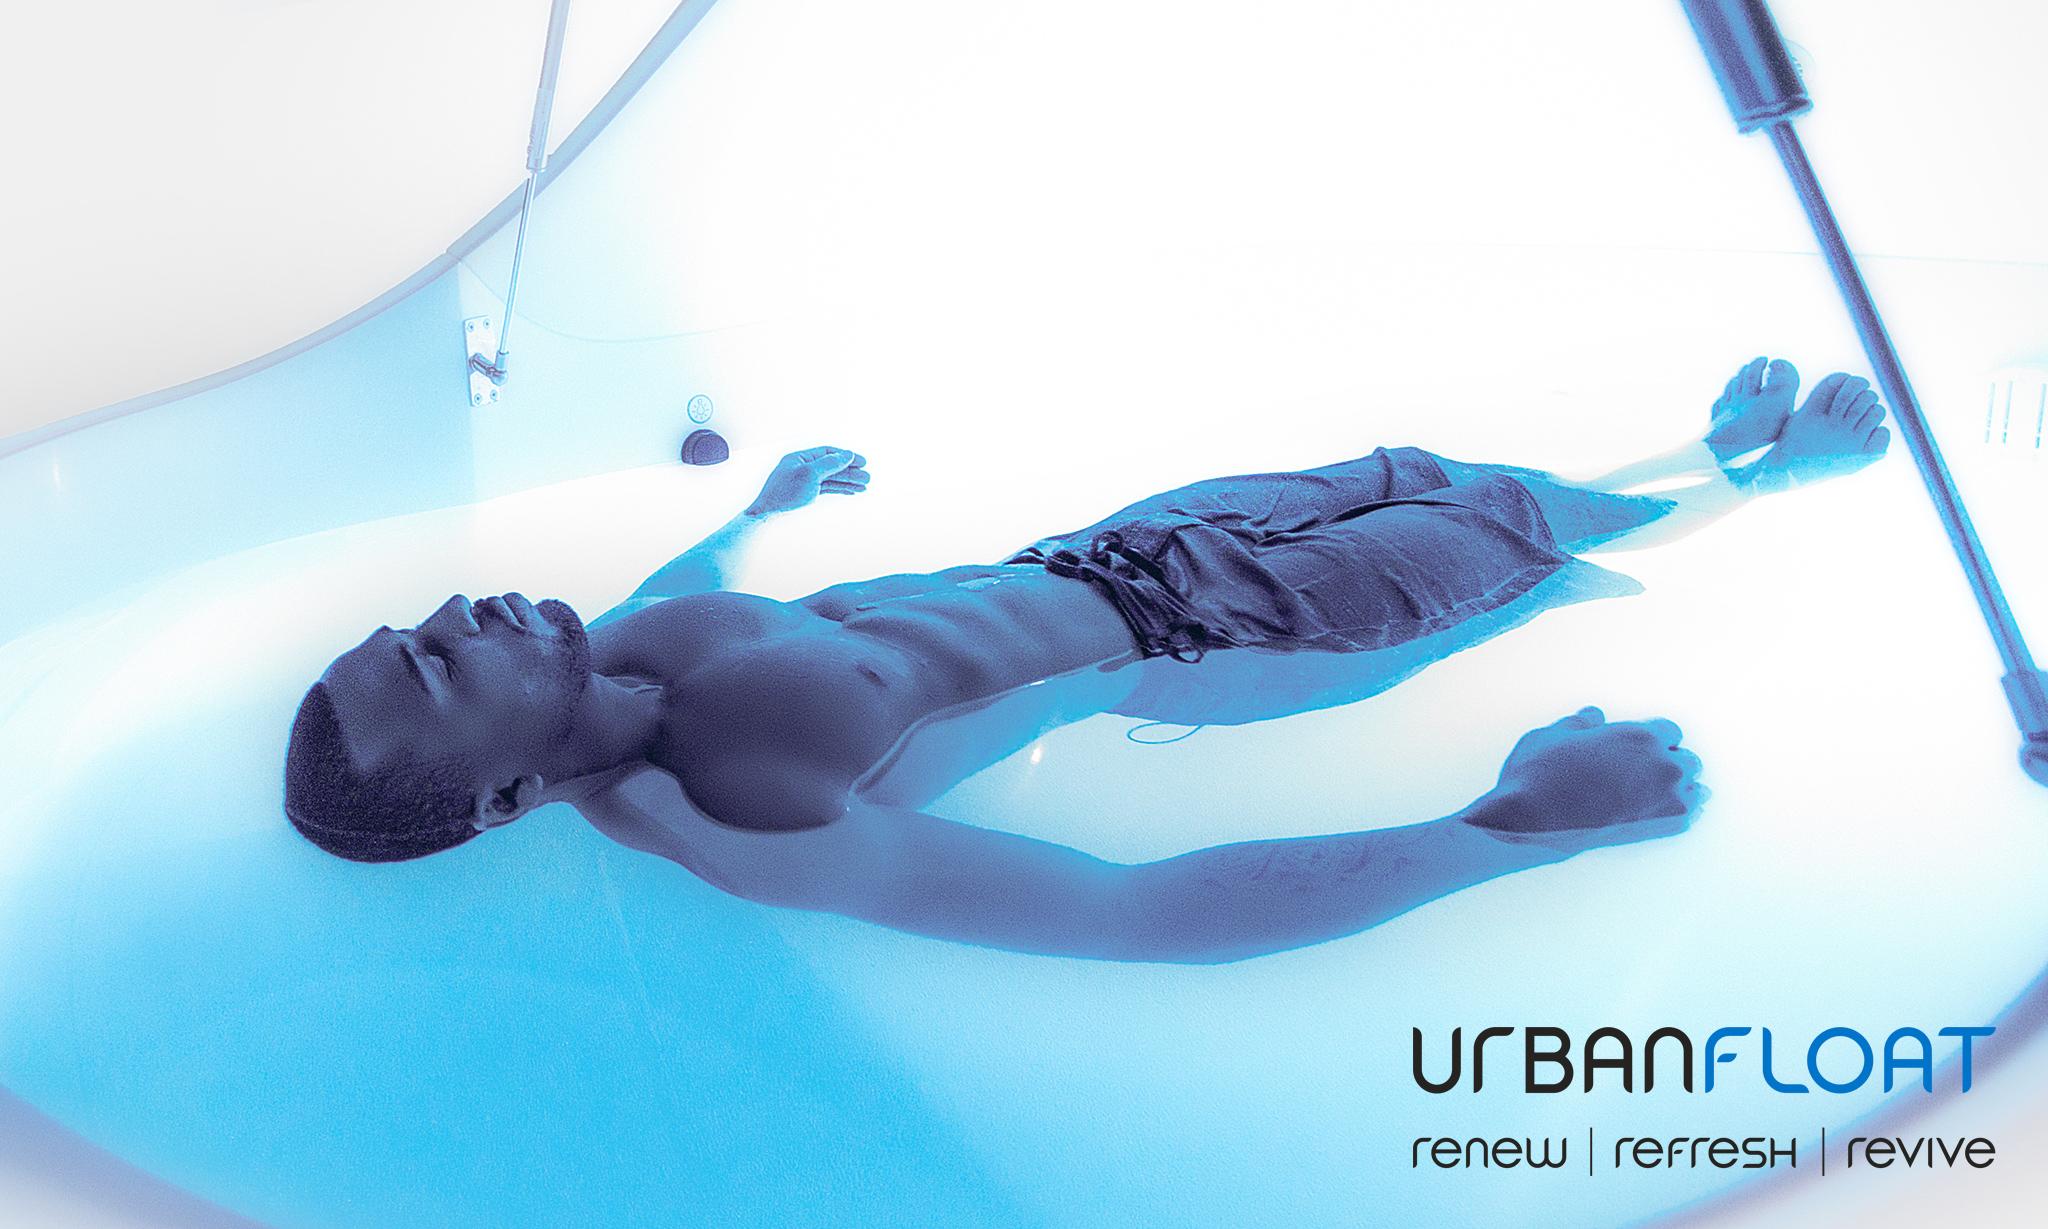 UrbanFloat-Floating-AfricanAmerican-Male-1.jpg